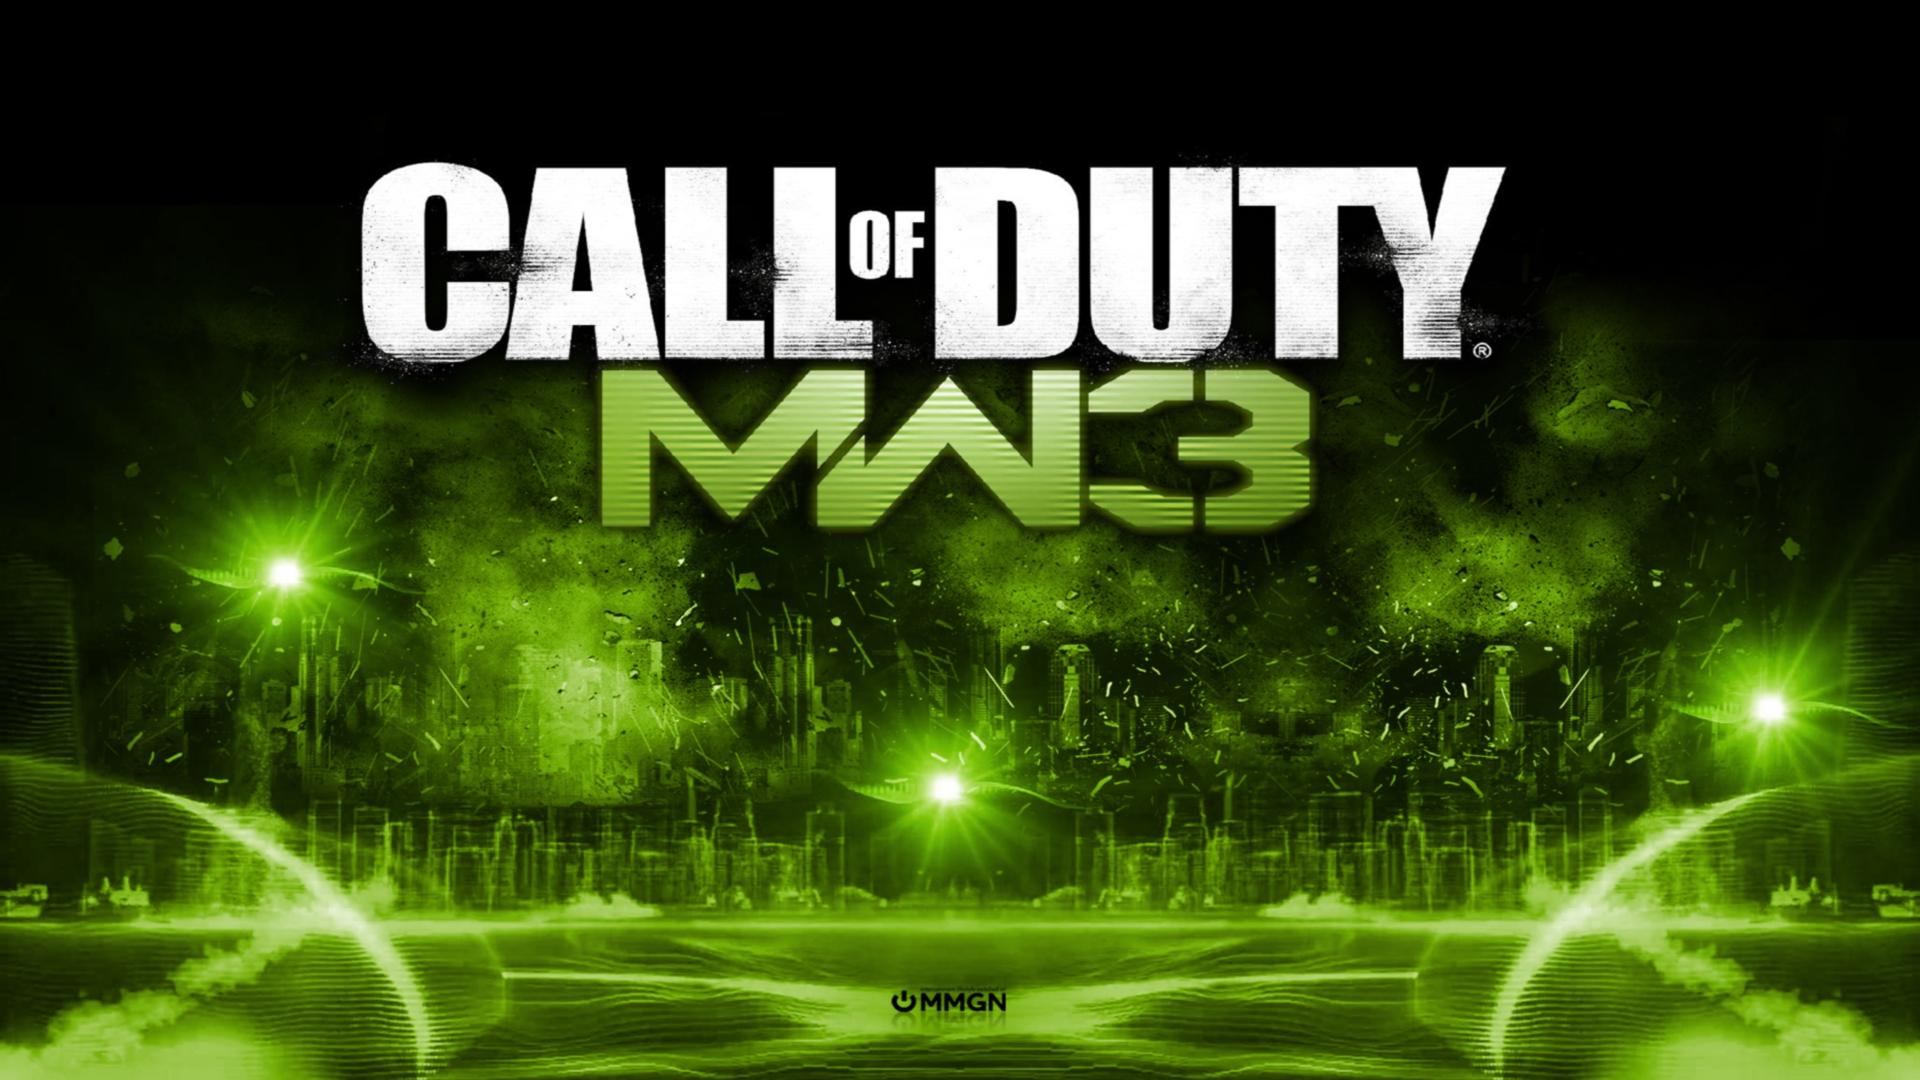 Call Of Duty Modern Warfare 3 HD Wallpapers